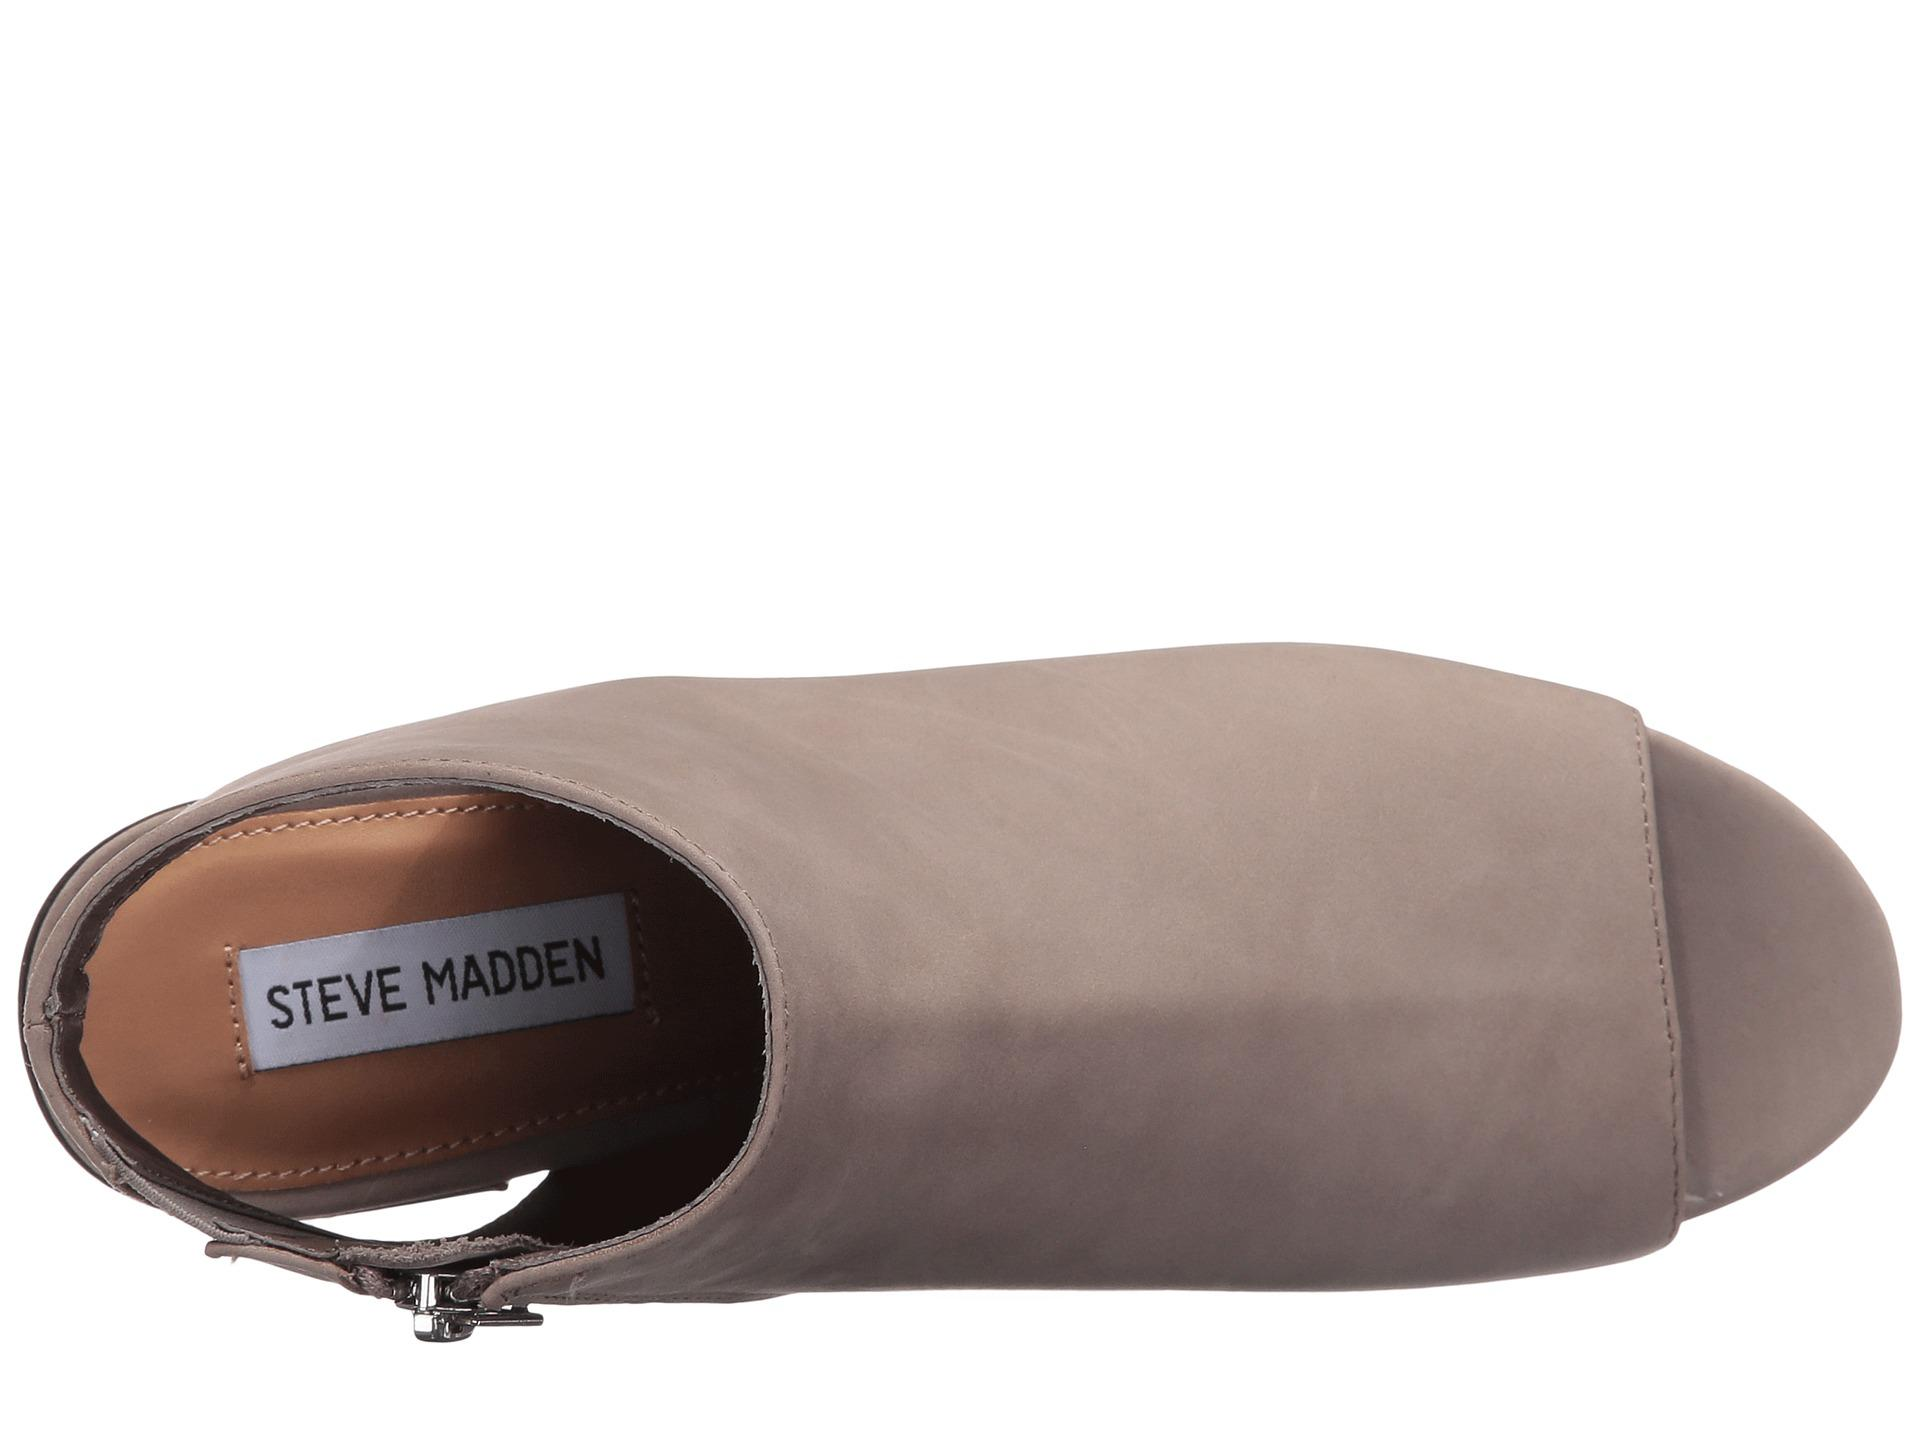 92713d1ccad Lyst - Steve Madden Rico in Gray